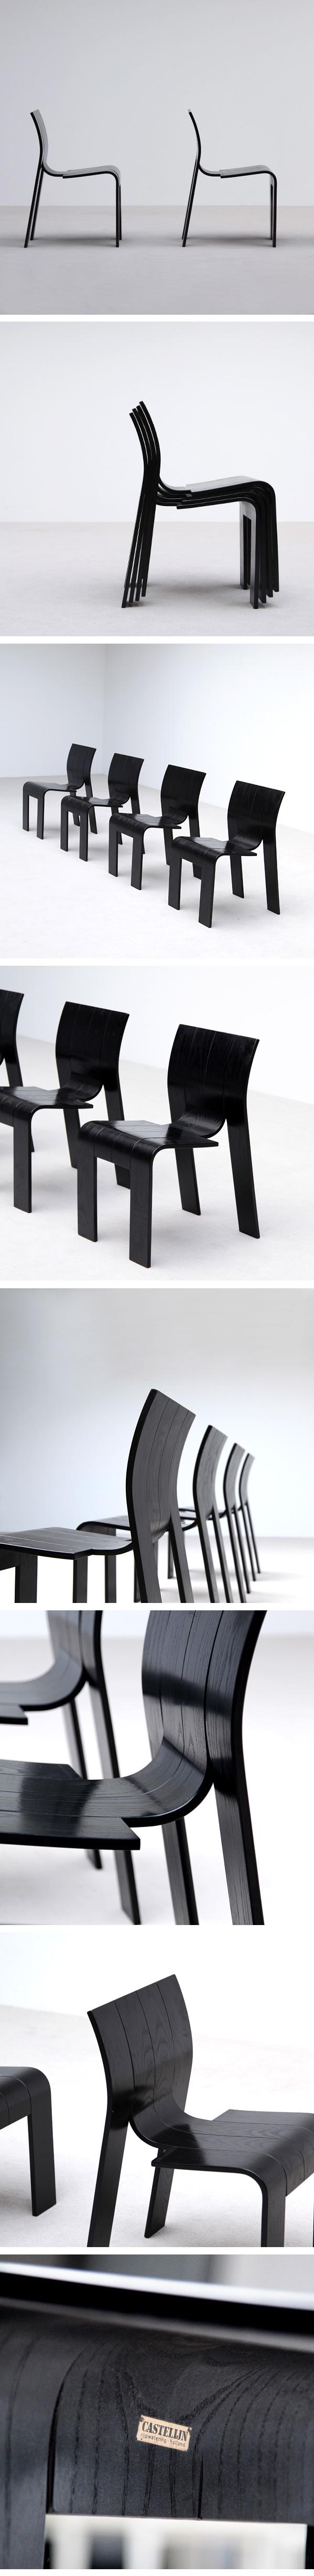 Gijs Bakker, strip, chairs, Castelijn, 1970s